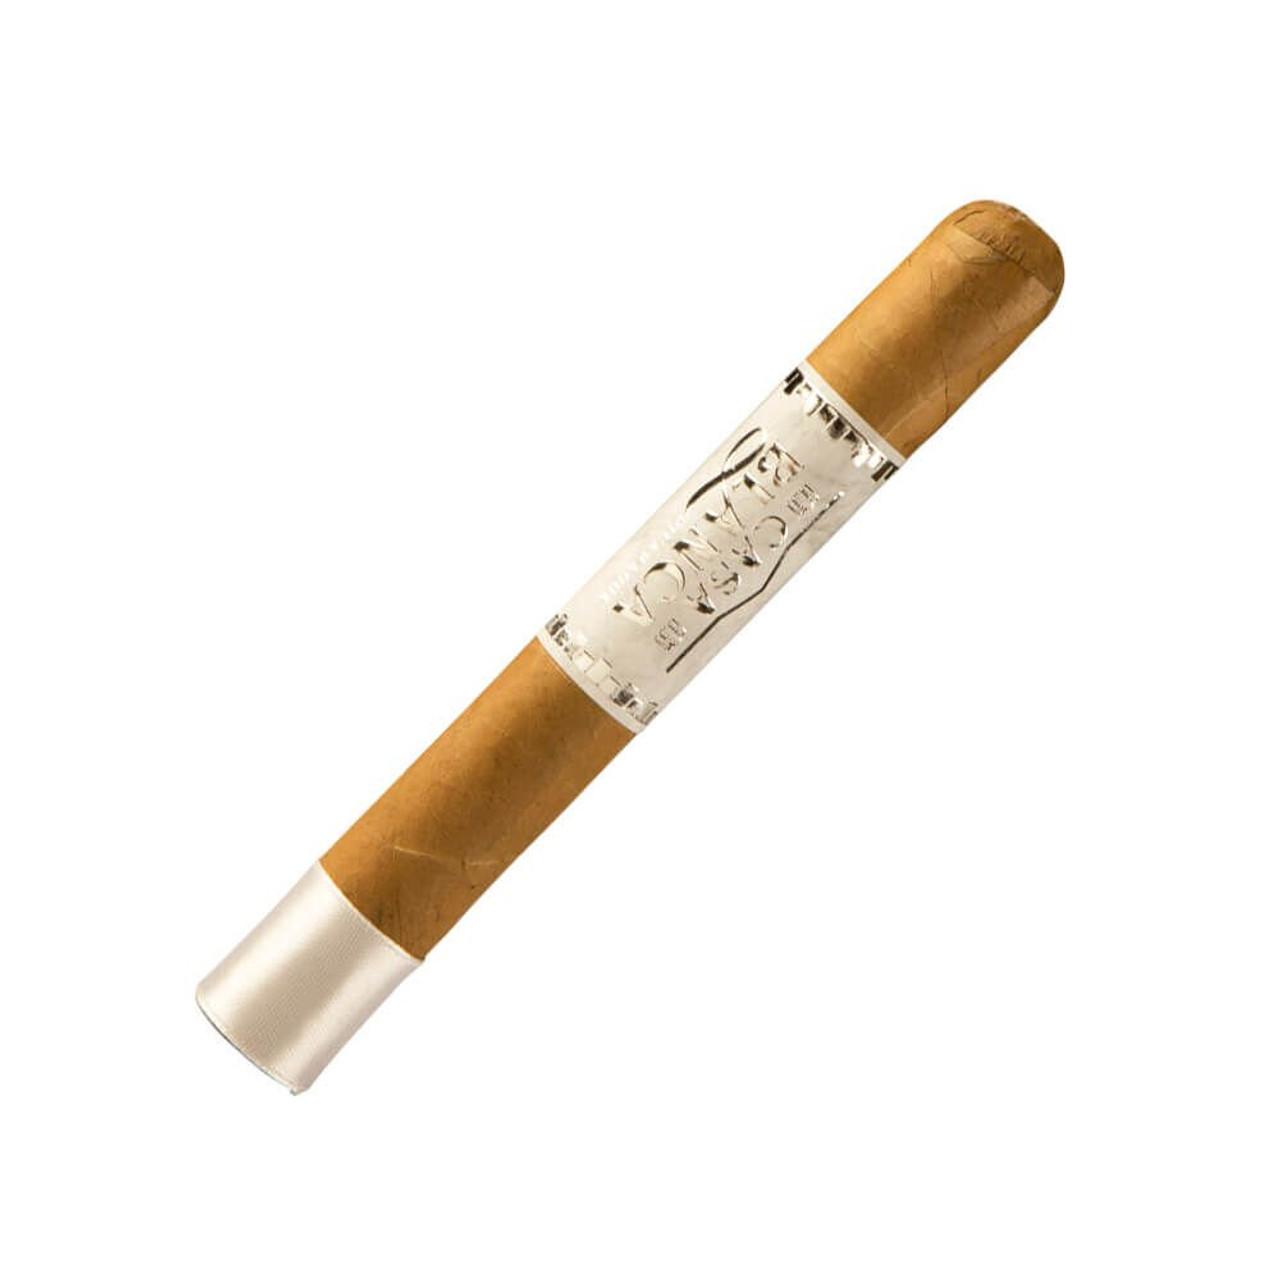 Casa Blanca Nicaragua President Natural Cigars - 7.5 x 50 (Box of 20)